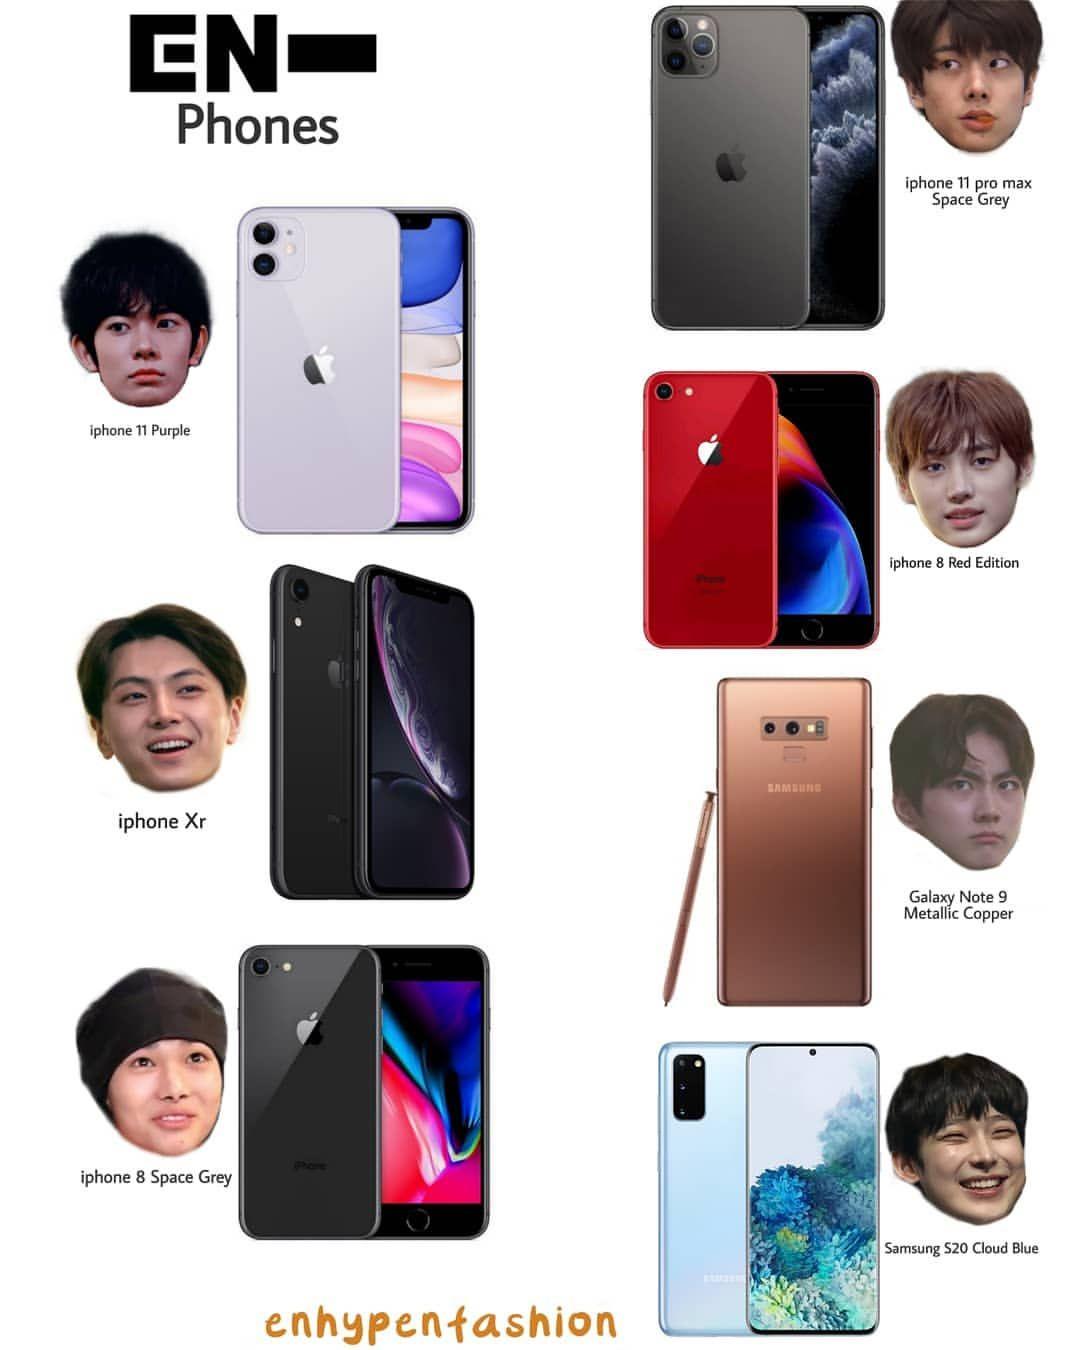 Enhypen Members Phones Enhypenfashion Members Don T Remove Credit Follo Cute Cartoon Images Cute Cartoon Iphone